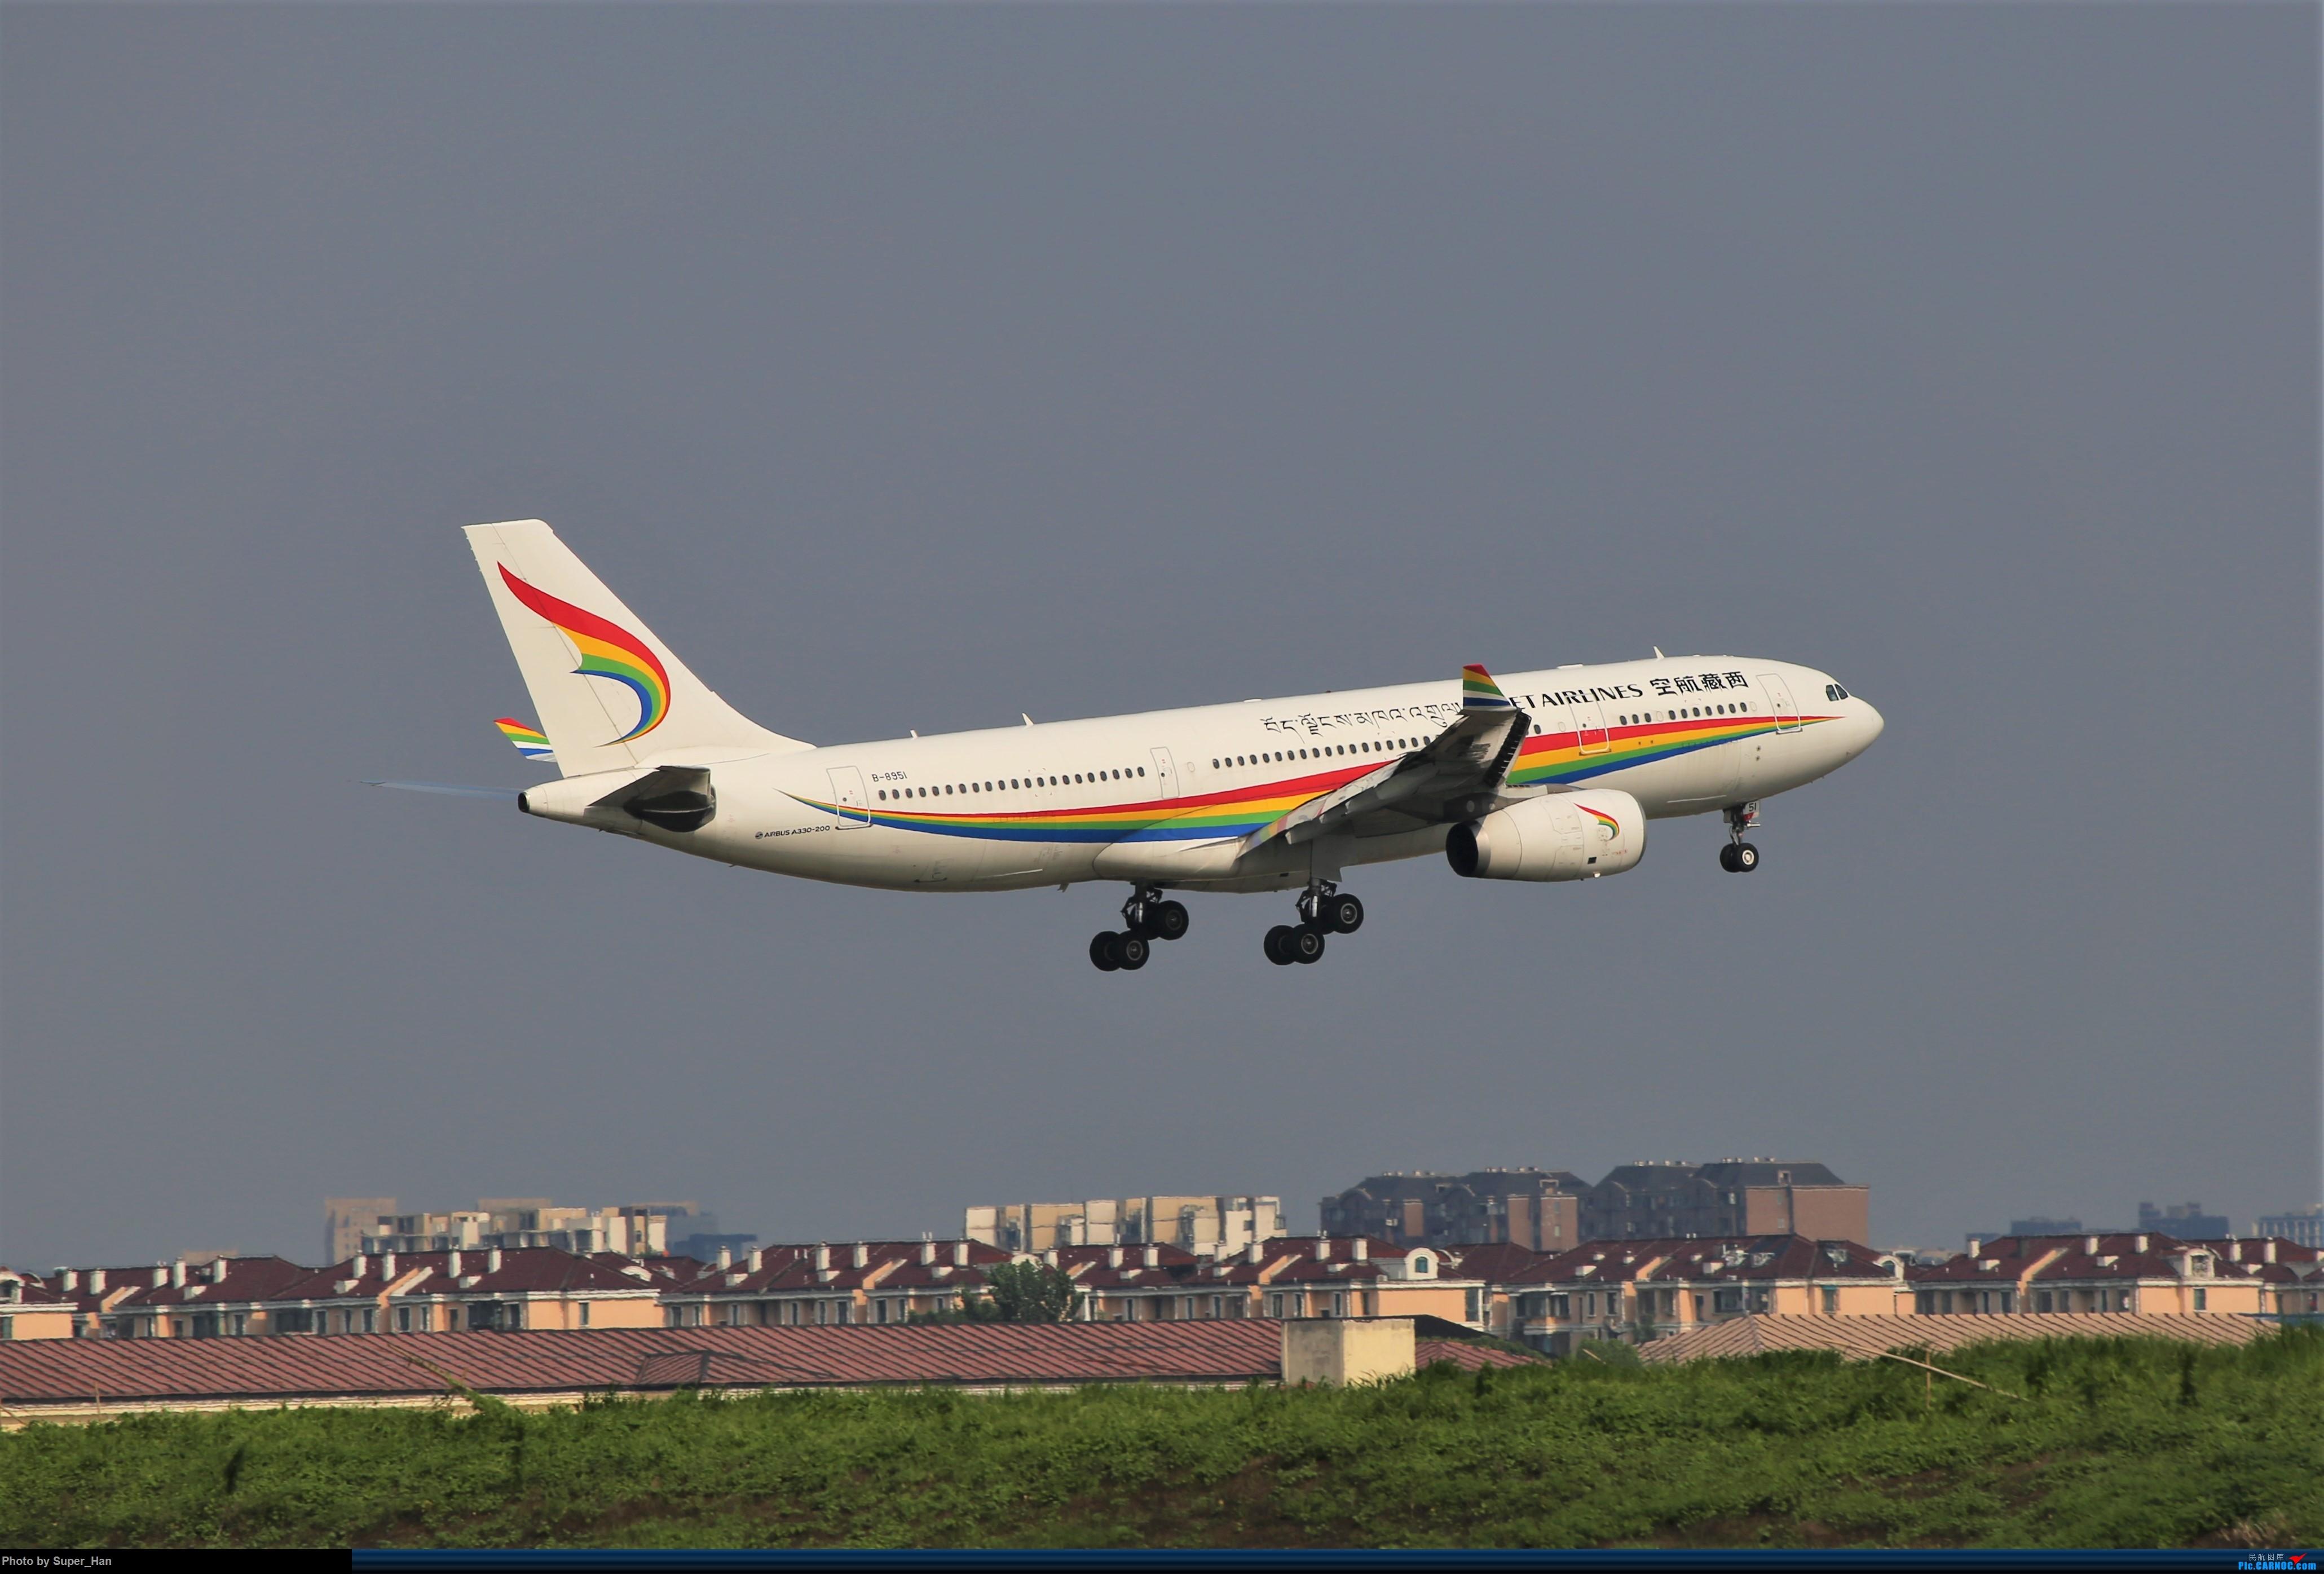 Re:[原创]0715去虹桥说走就走【最多的330篇】 AIRBUS A330-200 B-8951 中国上海虹桥国际机场